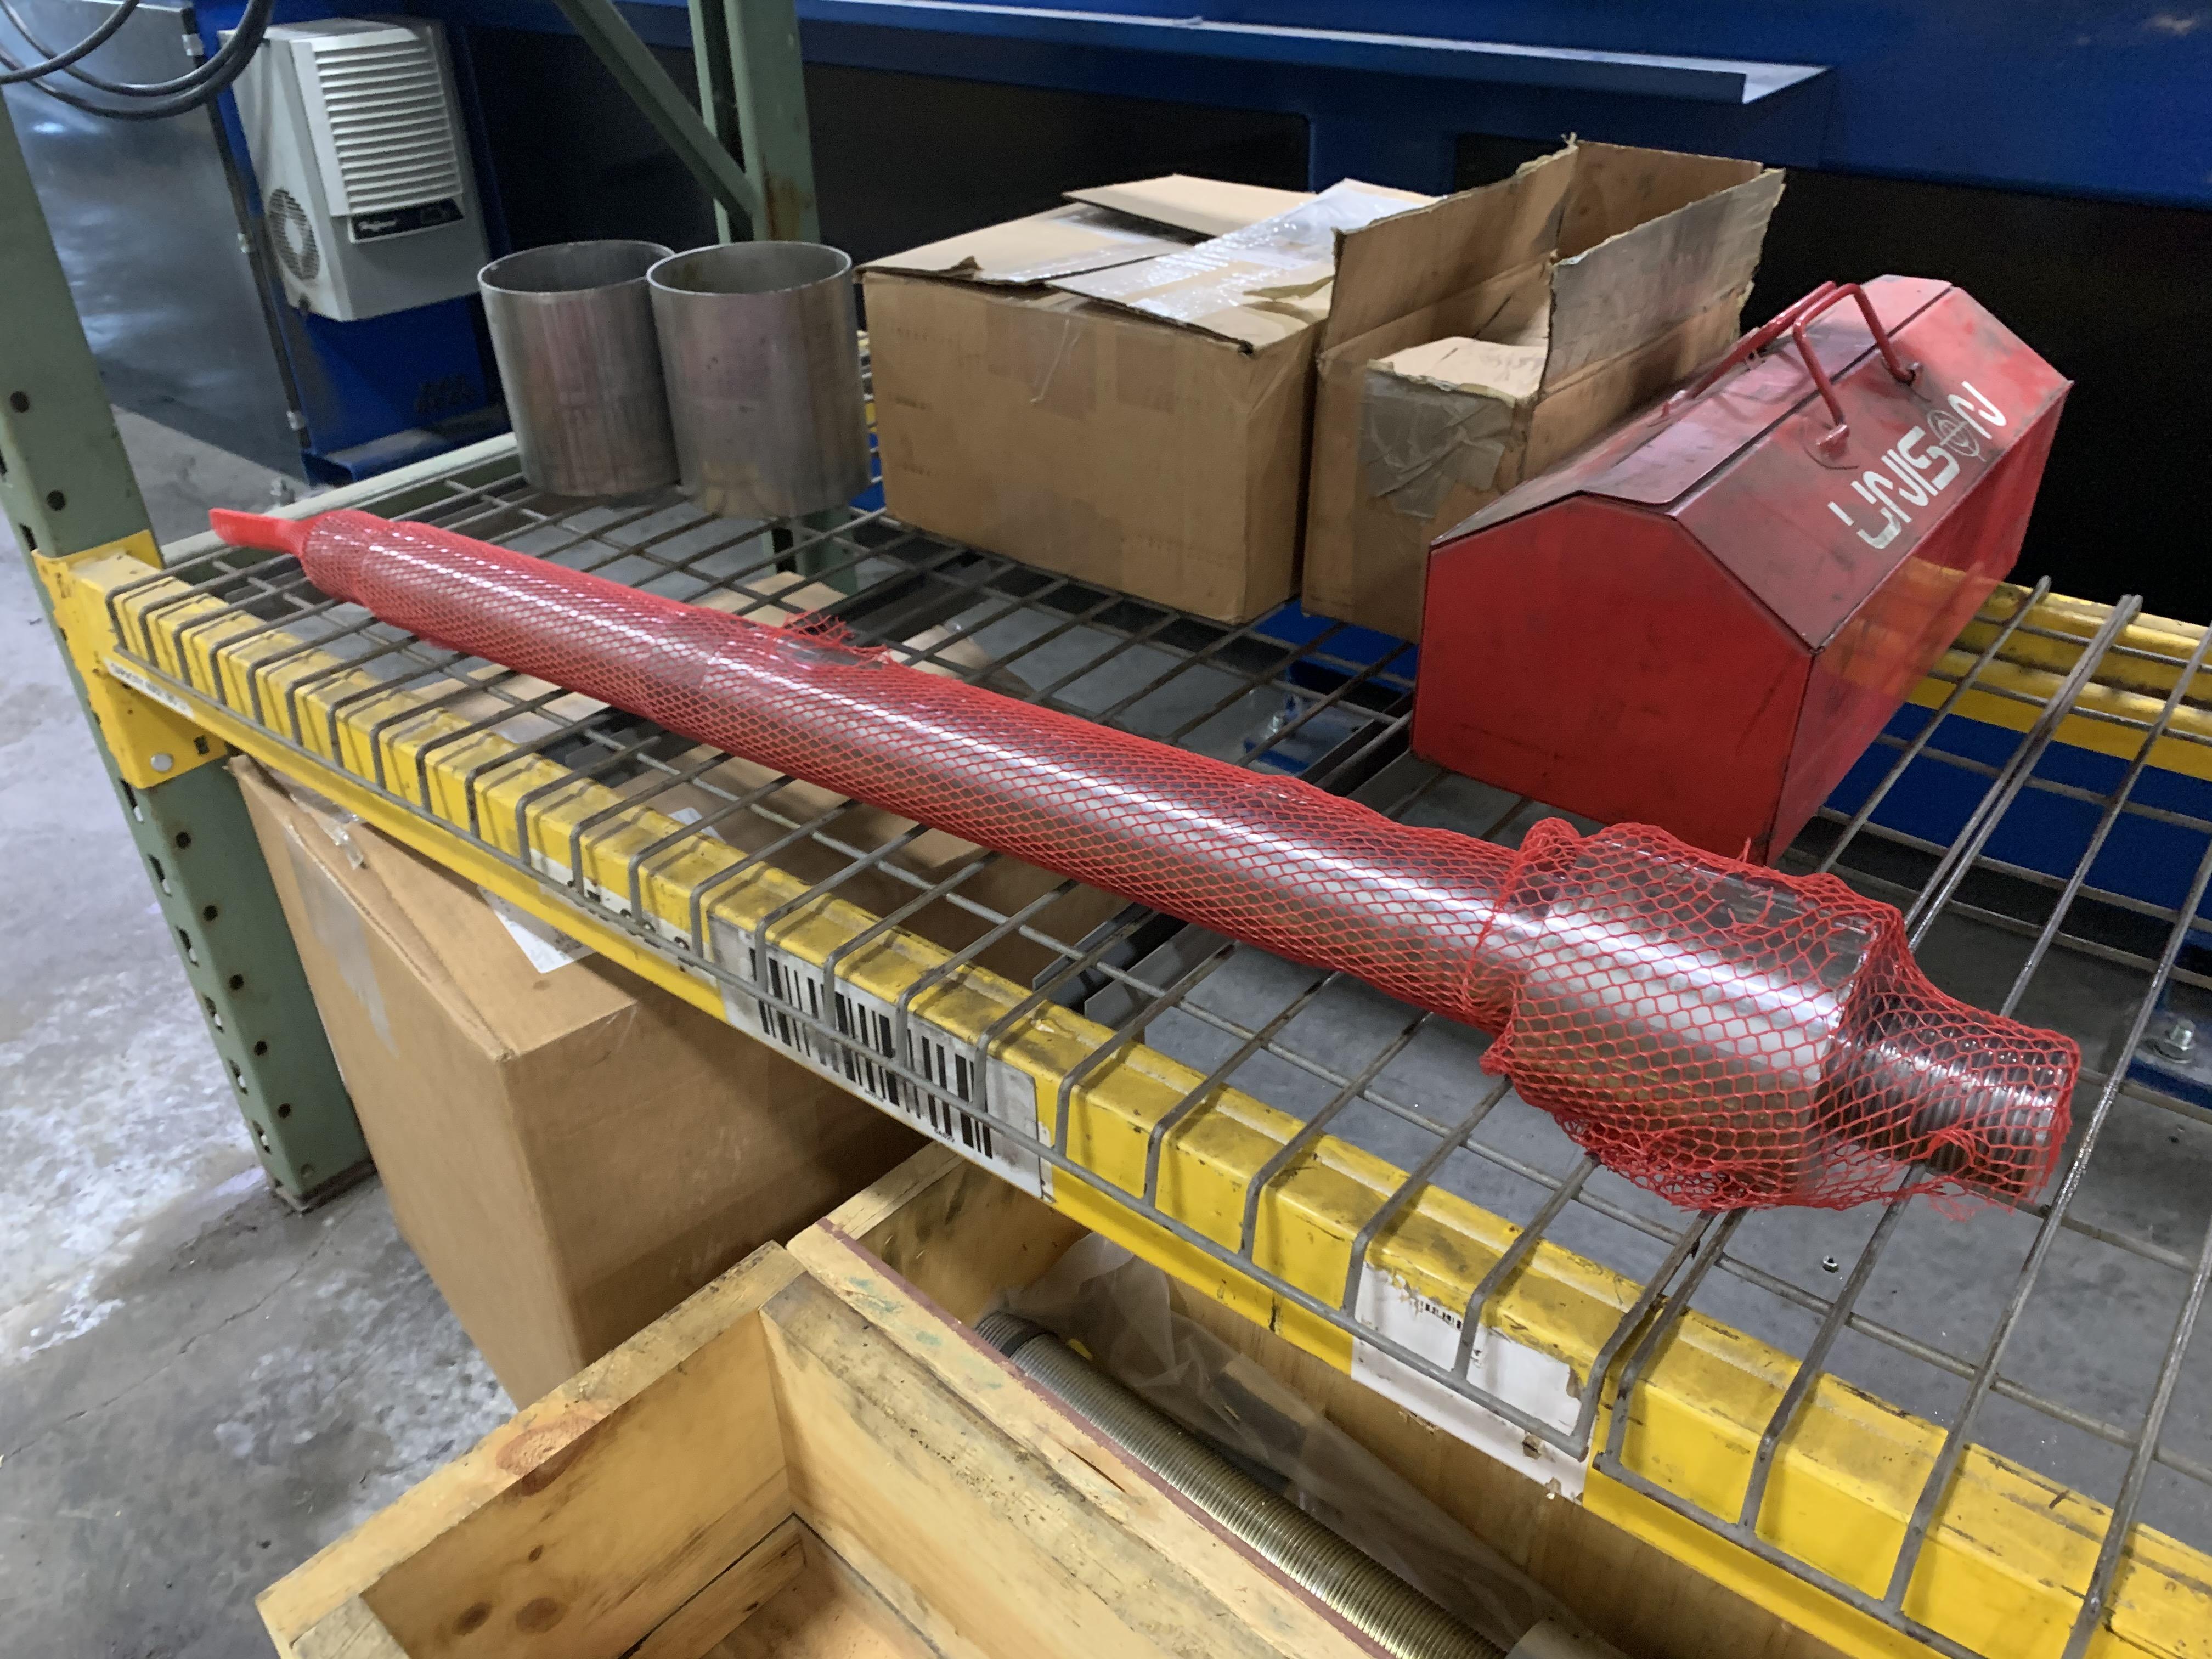 "6"" UNISON MODEL 6"" MS RH ELECTRIC CNC MULTI-STACK TUBE BENDER; S/N 2715, JOB NO. ME 4-410,(NEW 2014) - Image 68 of 72"